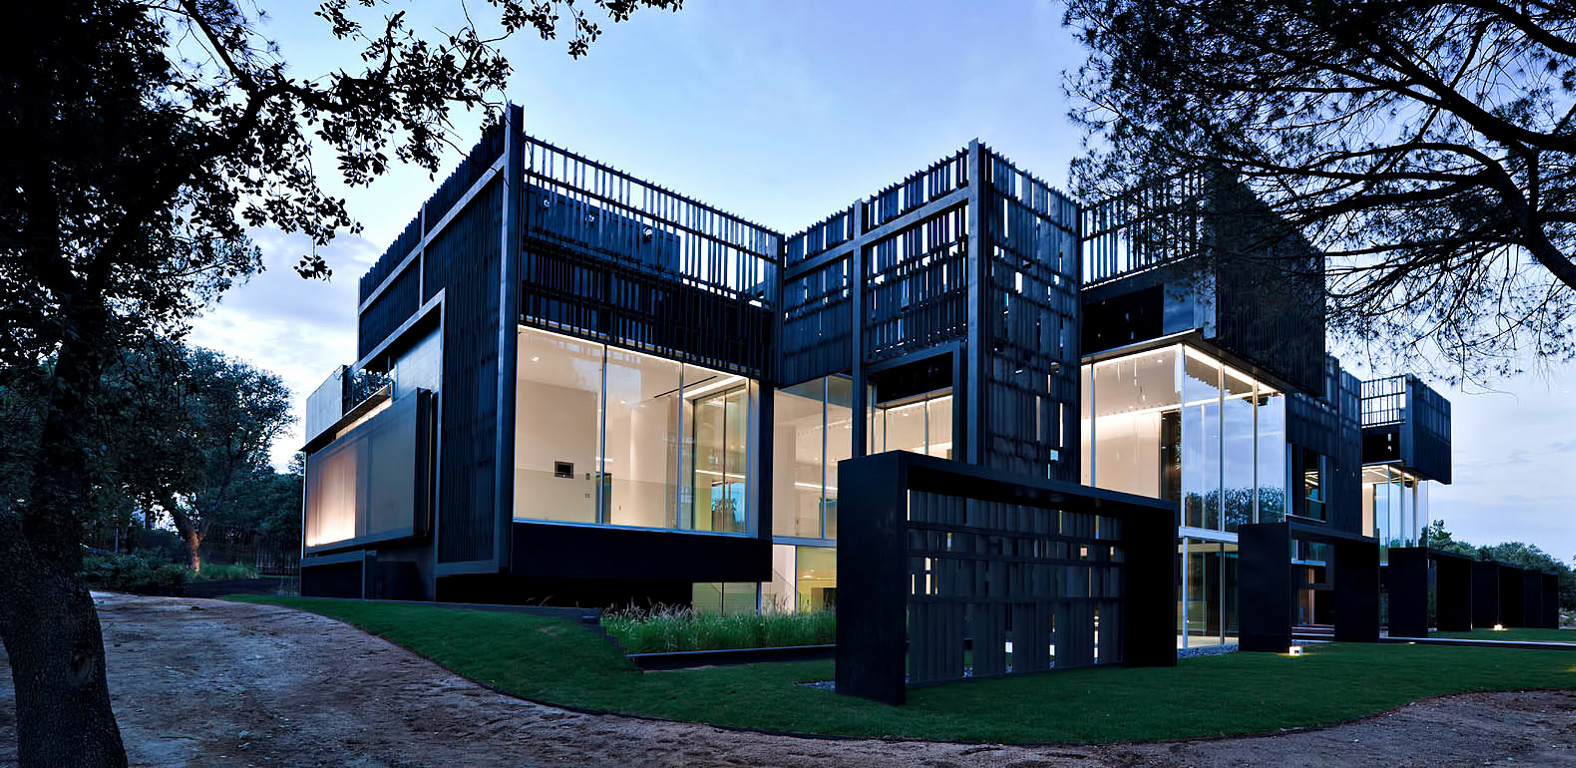 099 – La Moraleja Luxury Residence – Alcobendas, Madrid, Spain